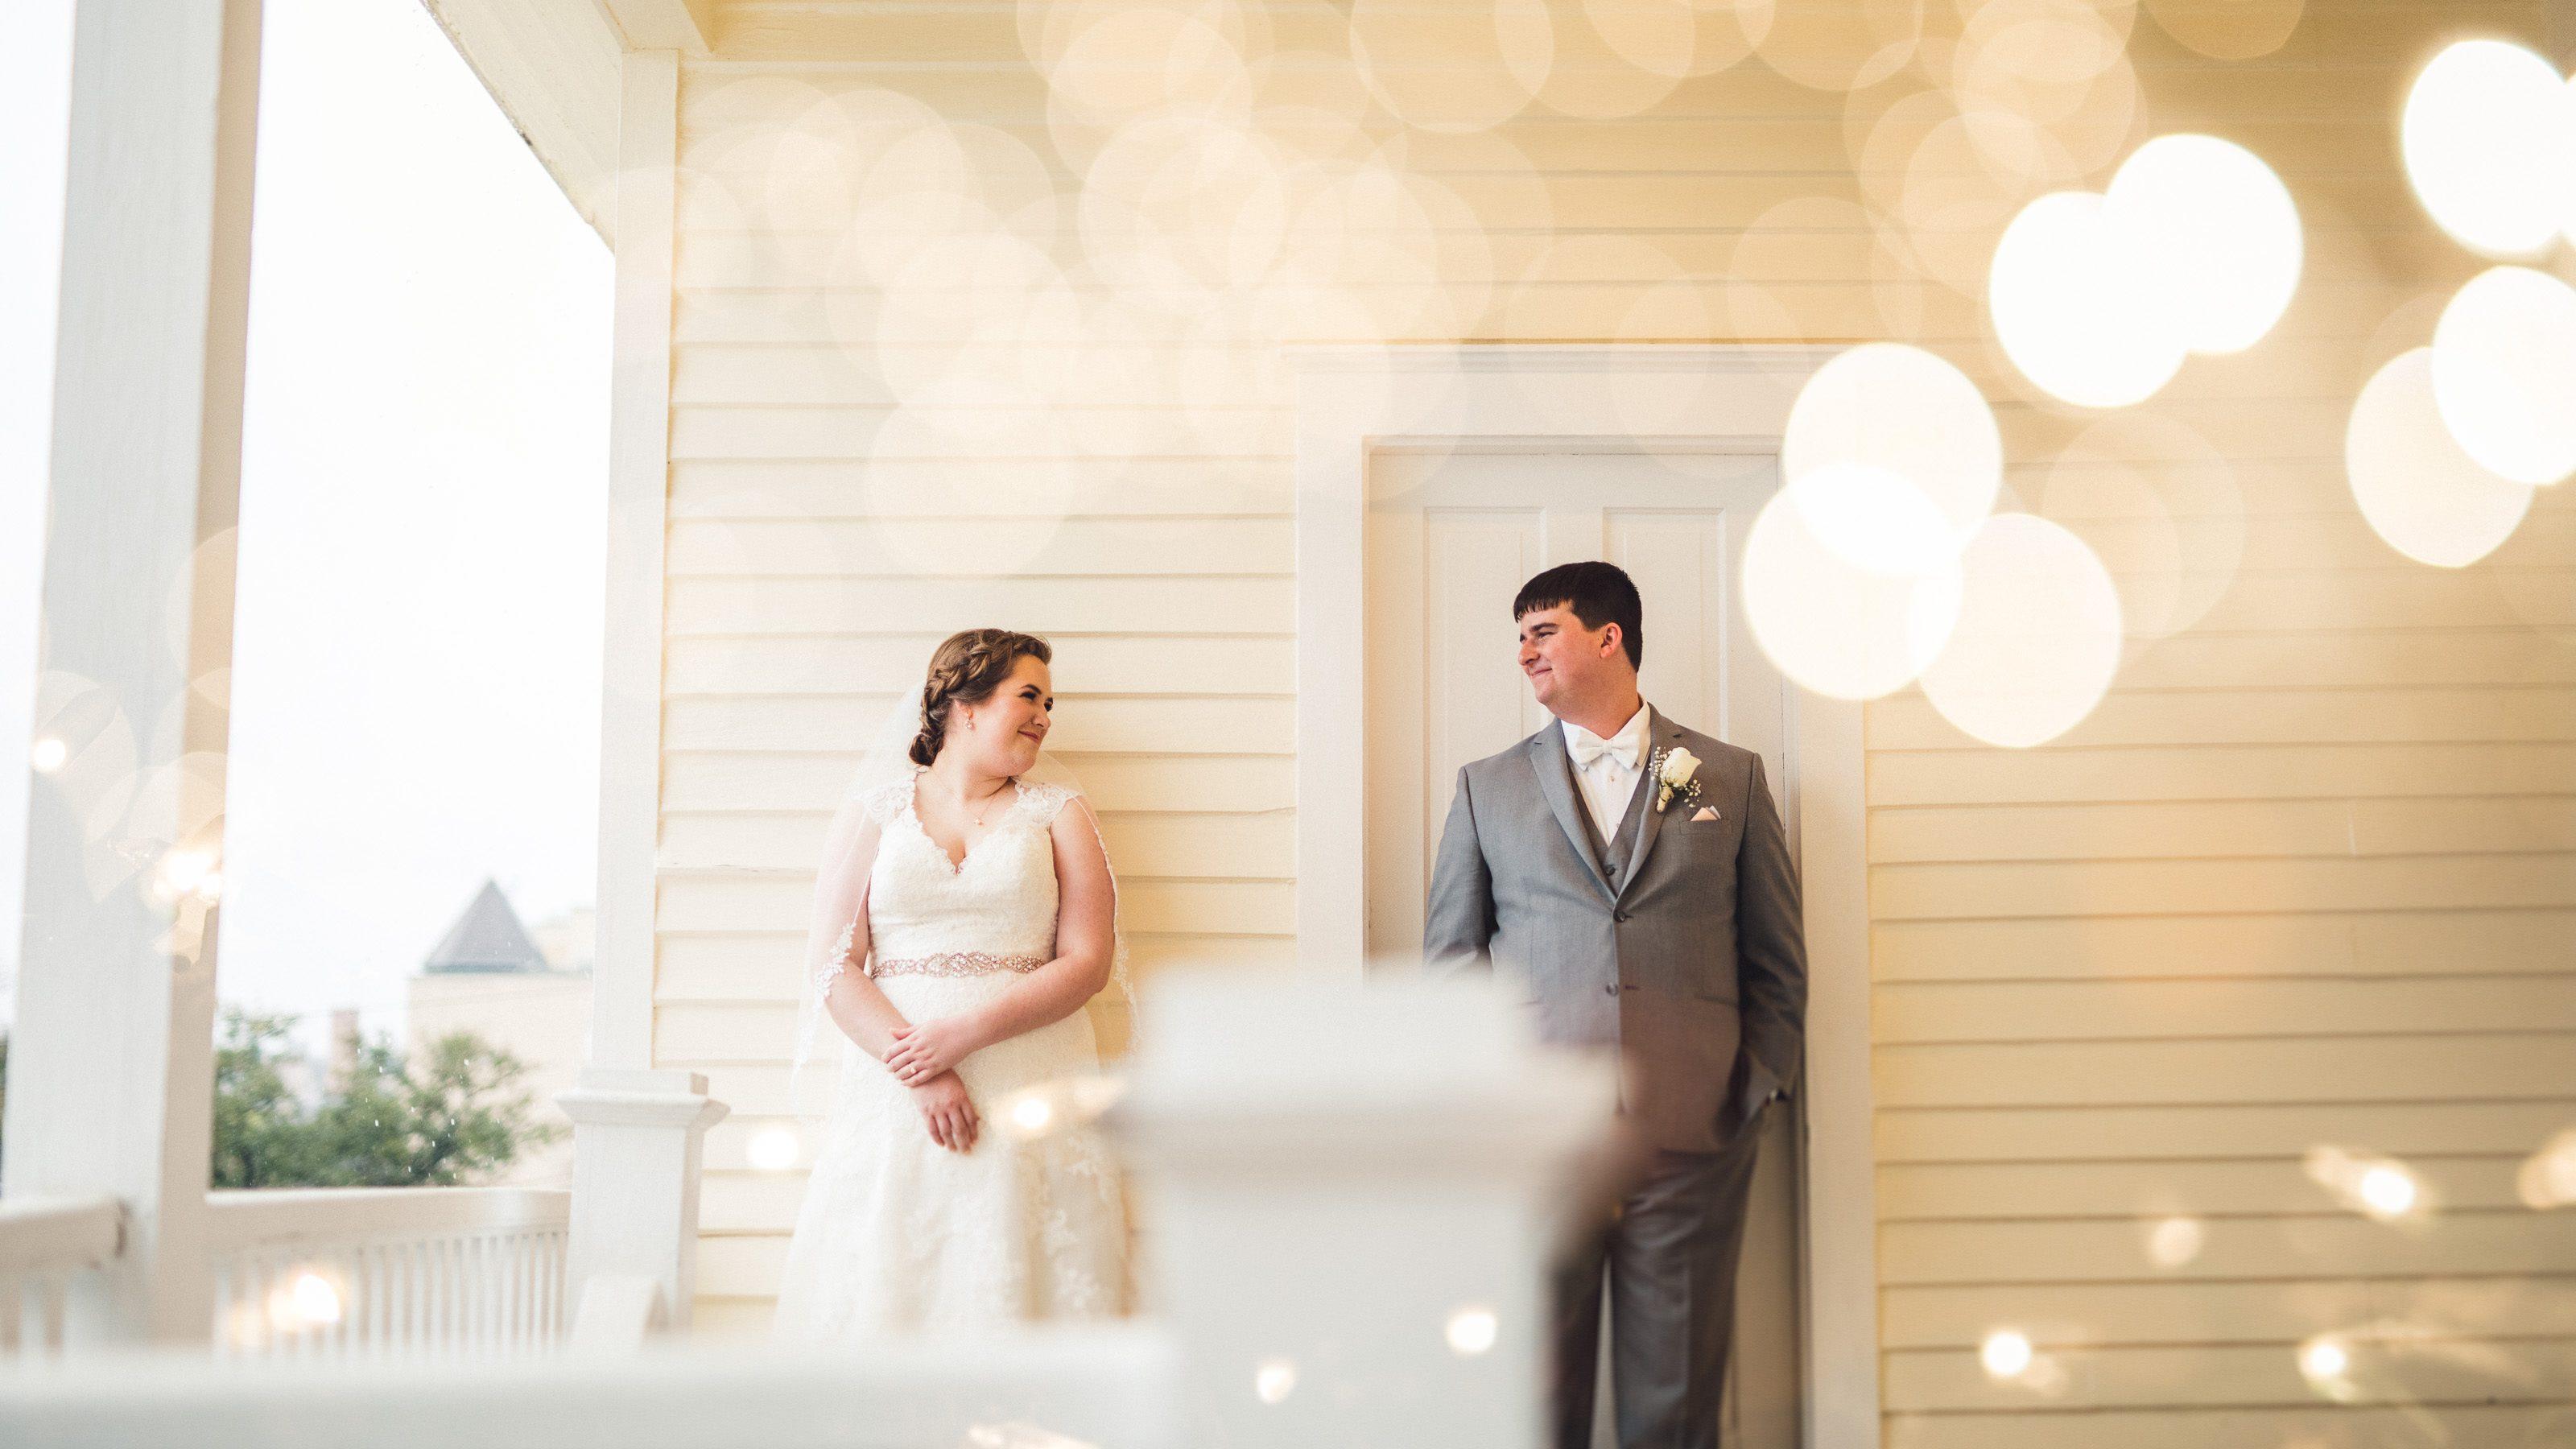 Spring Wedding at The Allan House // Leeann + Tom